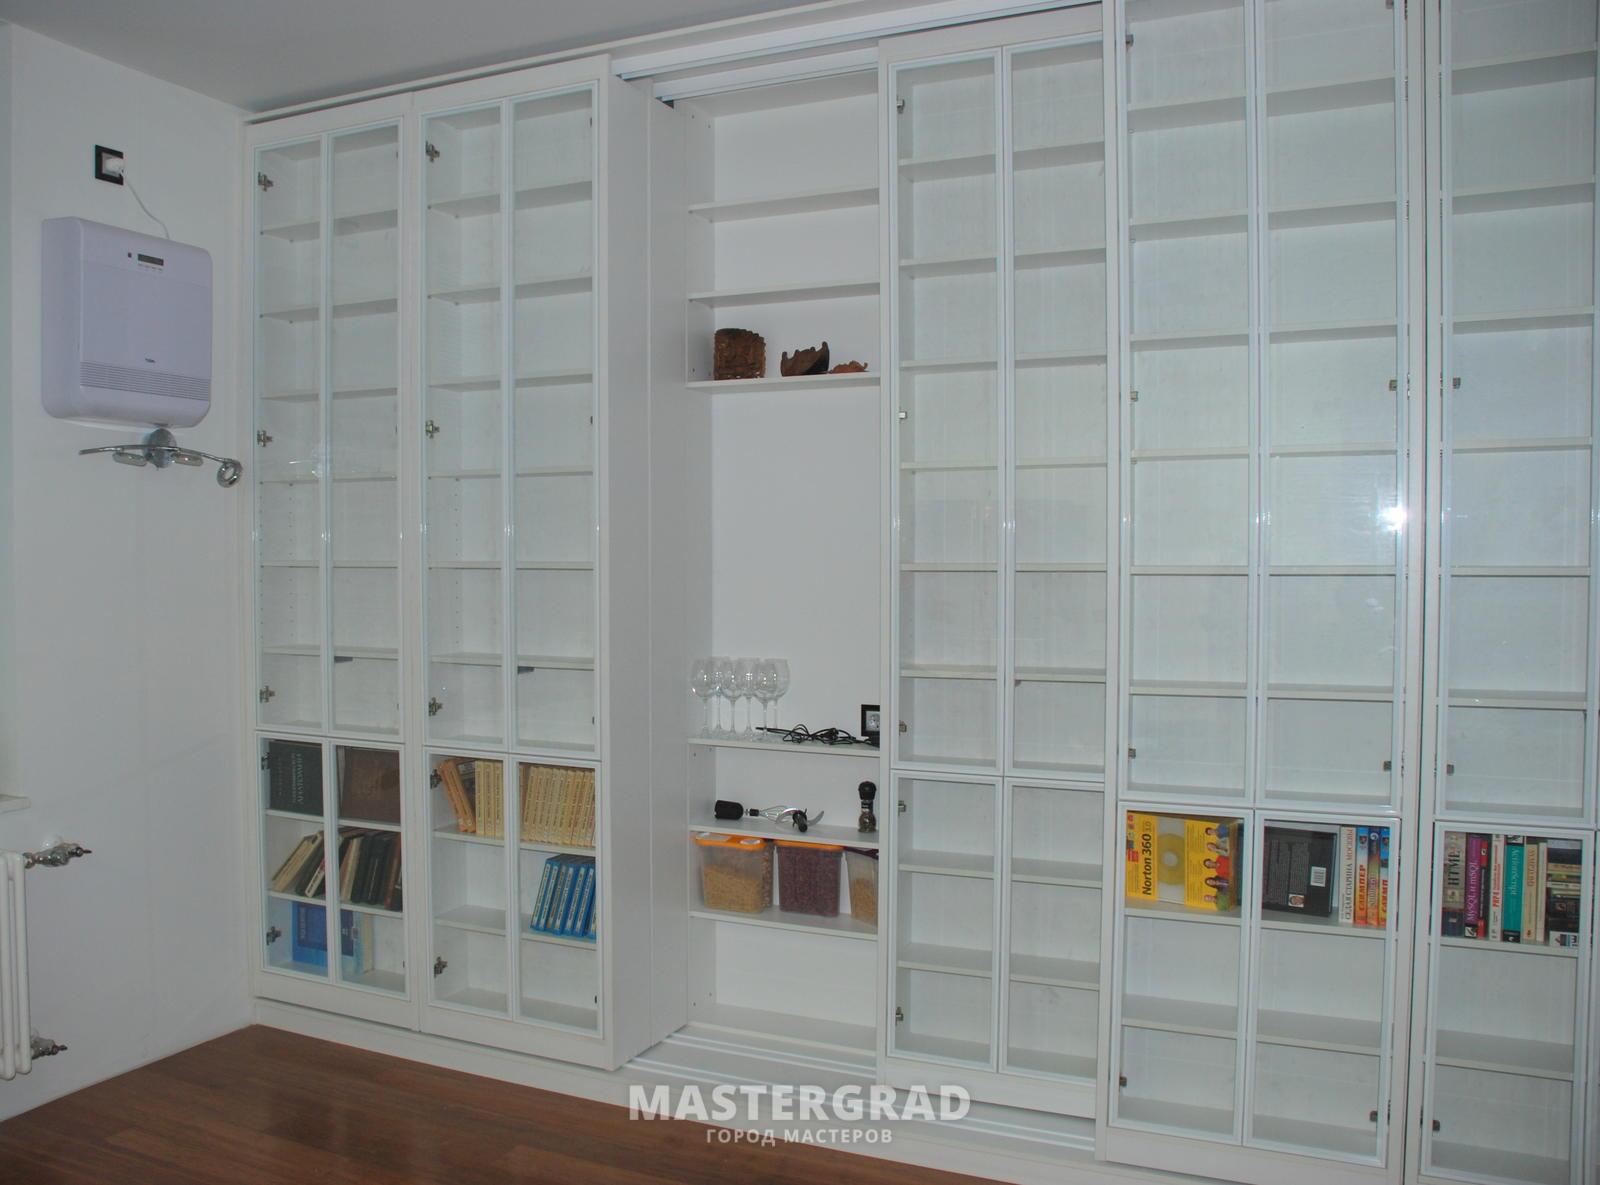 Библиотека раздвижная новая, москва регион, москва. цена 280.